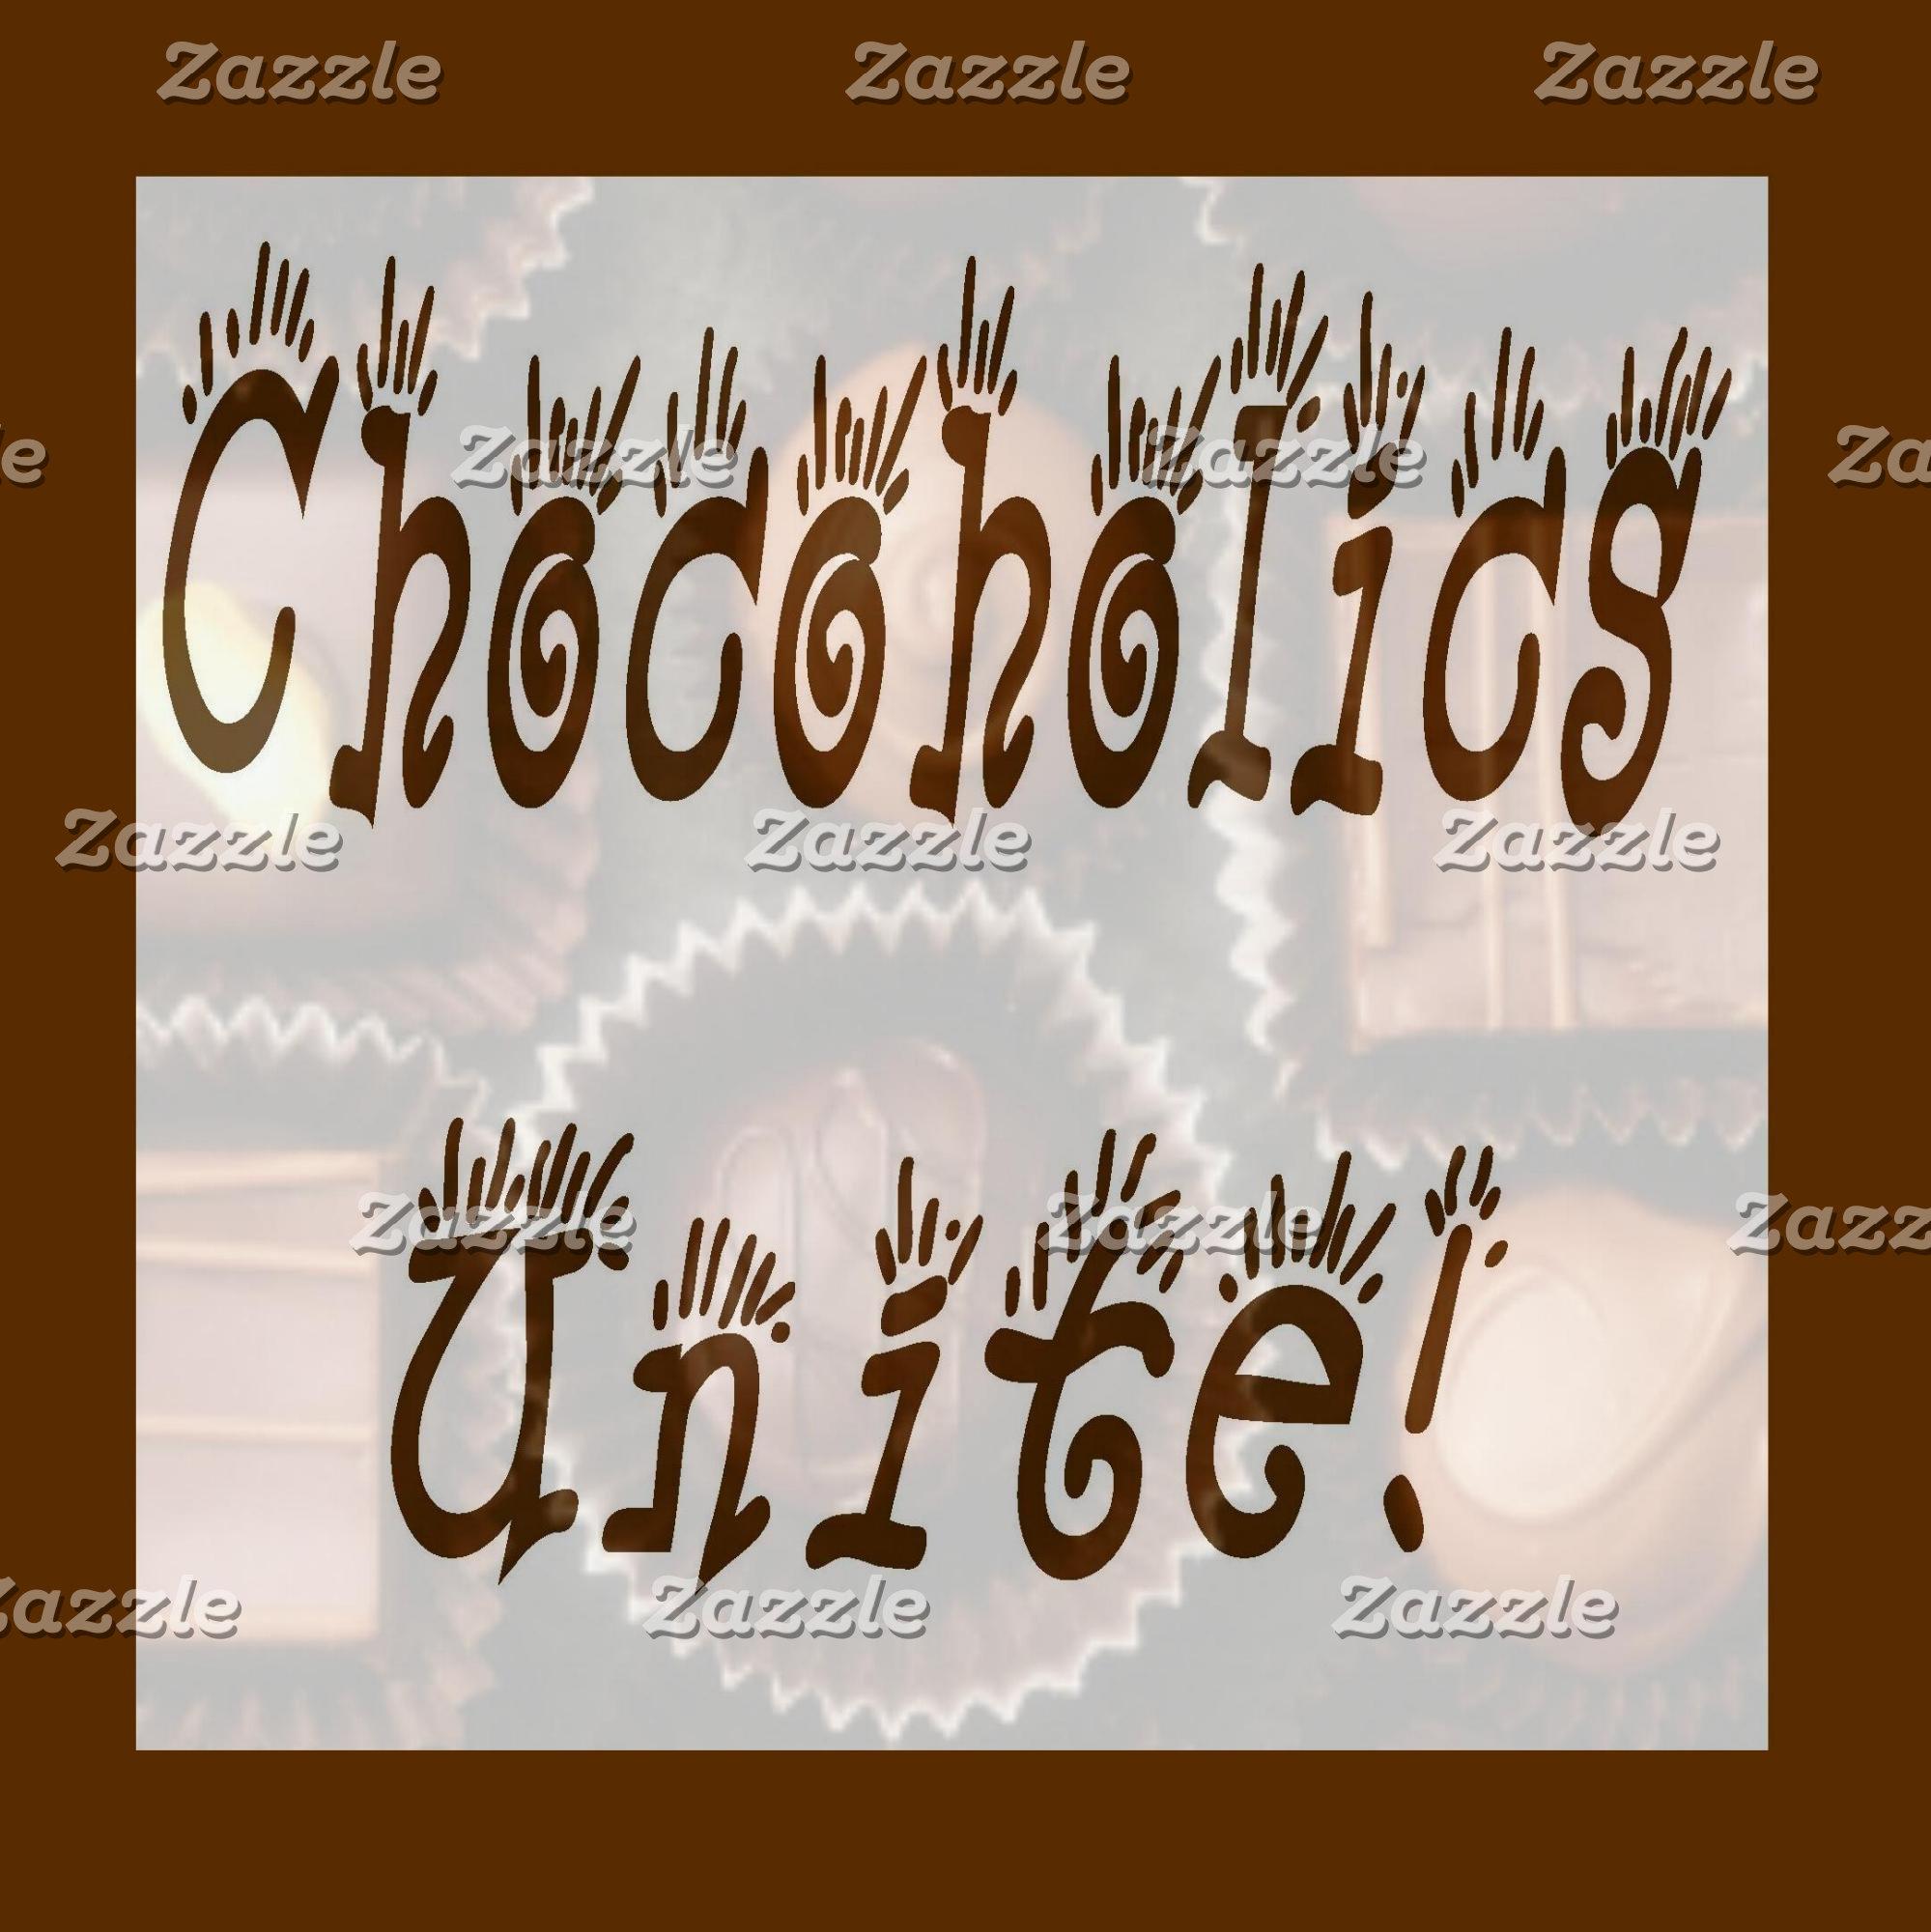 Chocoholics Unite!